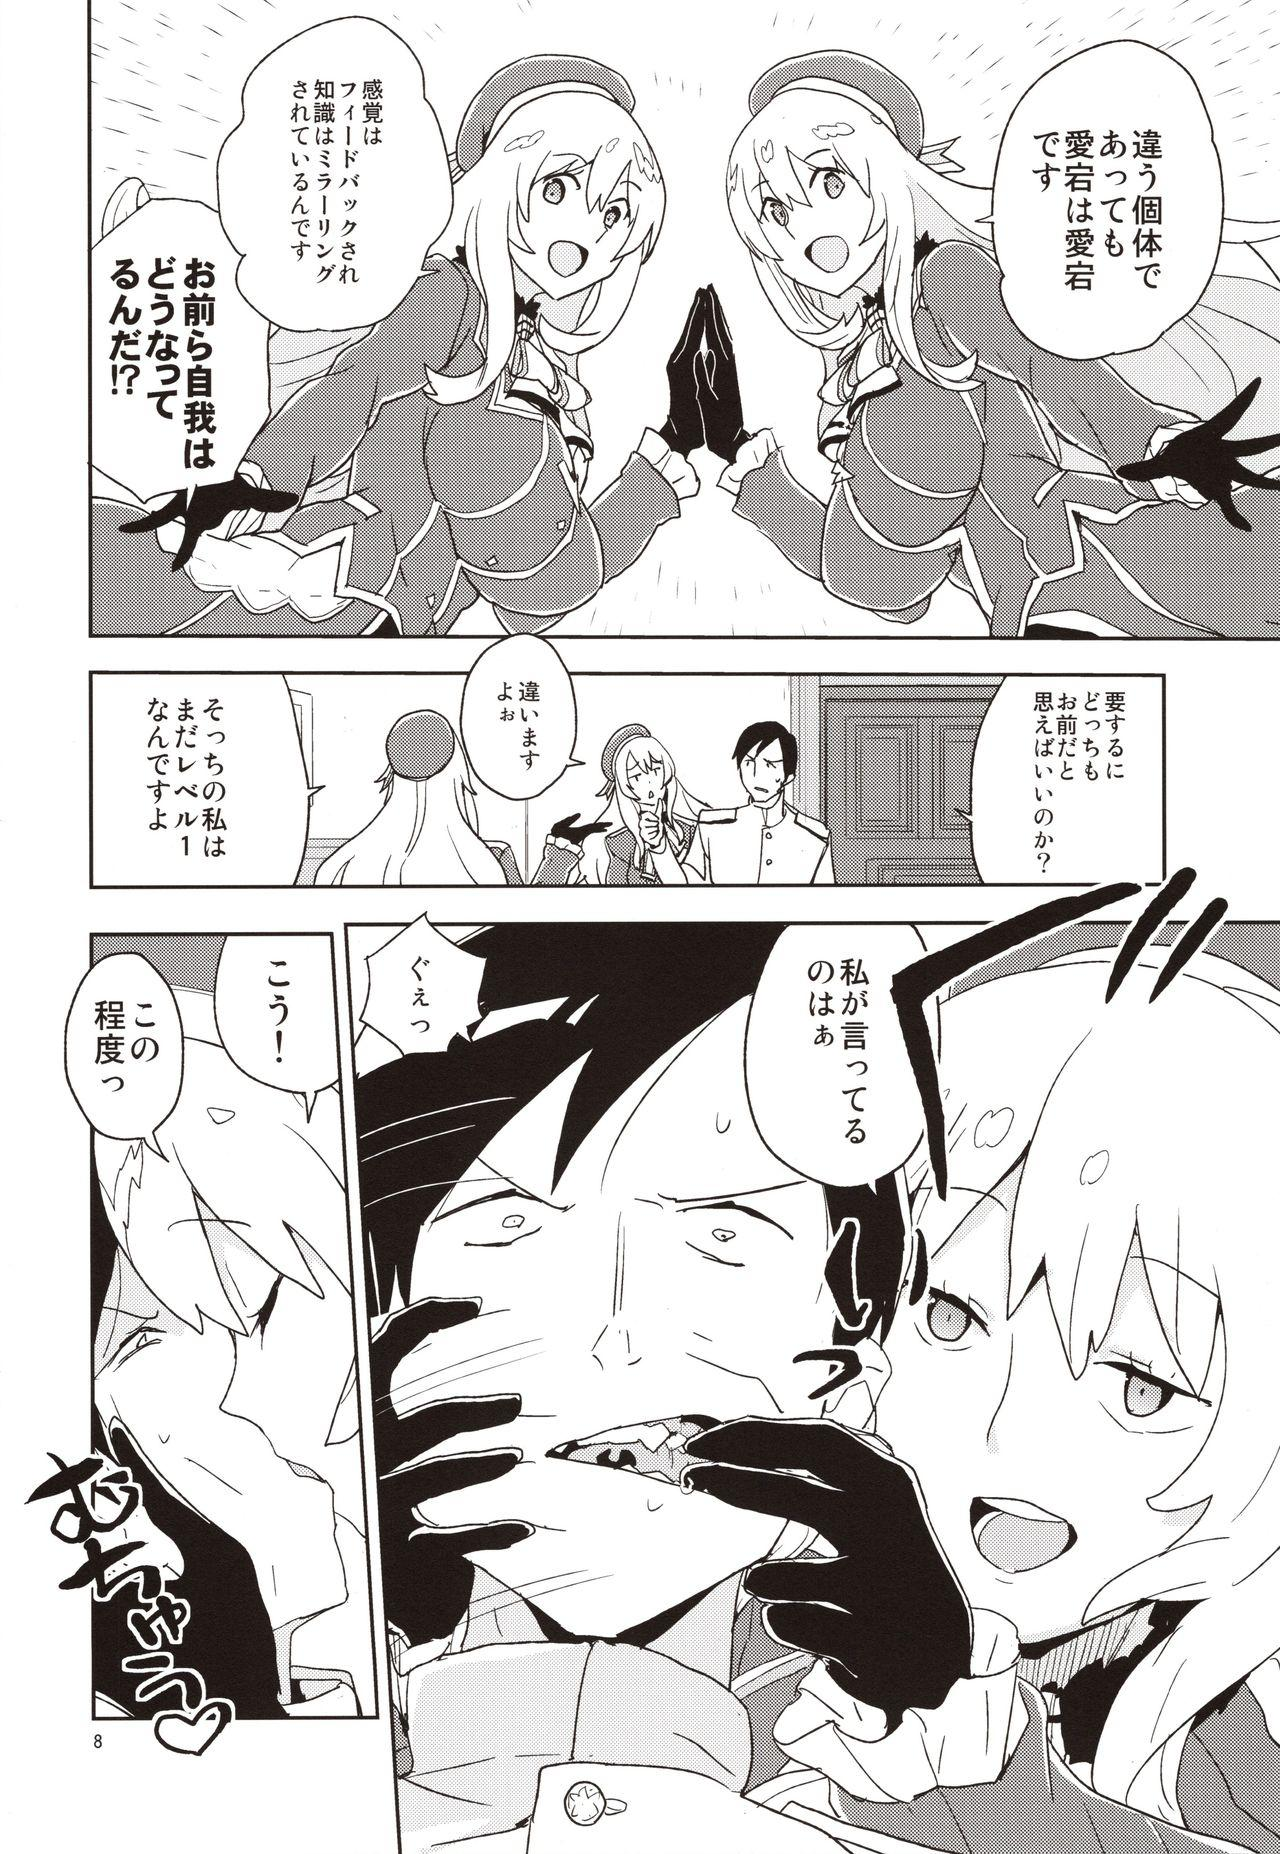 Atago-san no Nijou 6